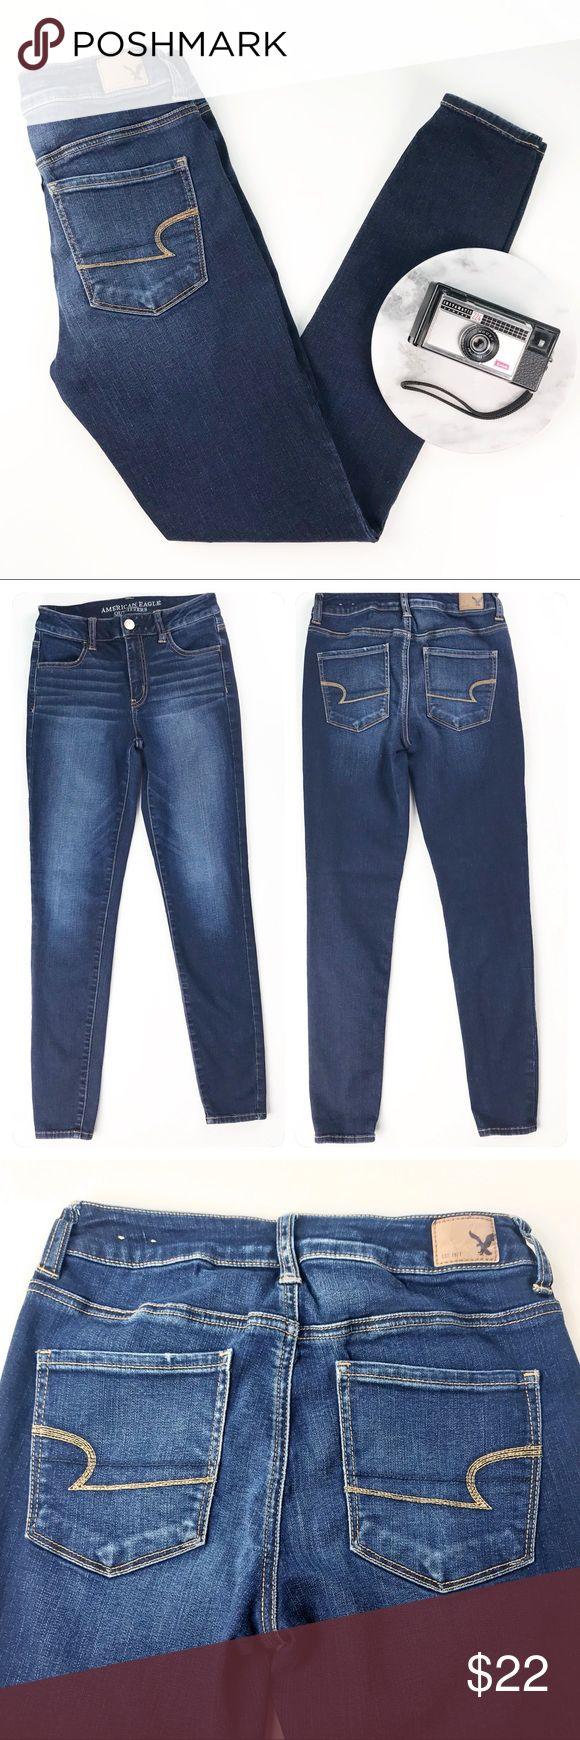 9 leg opening skinny jeans